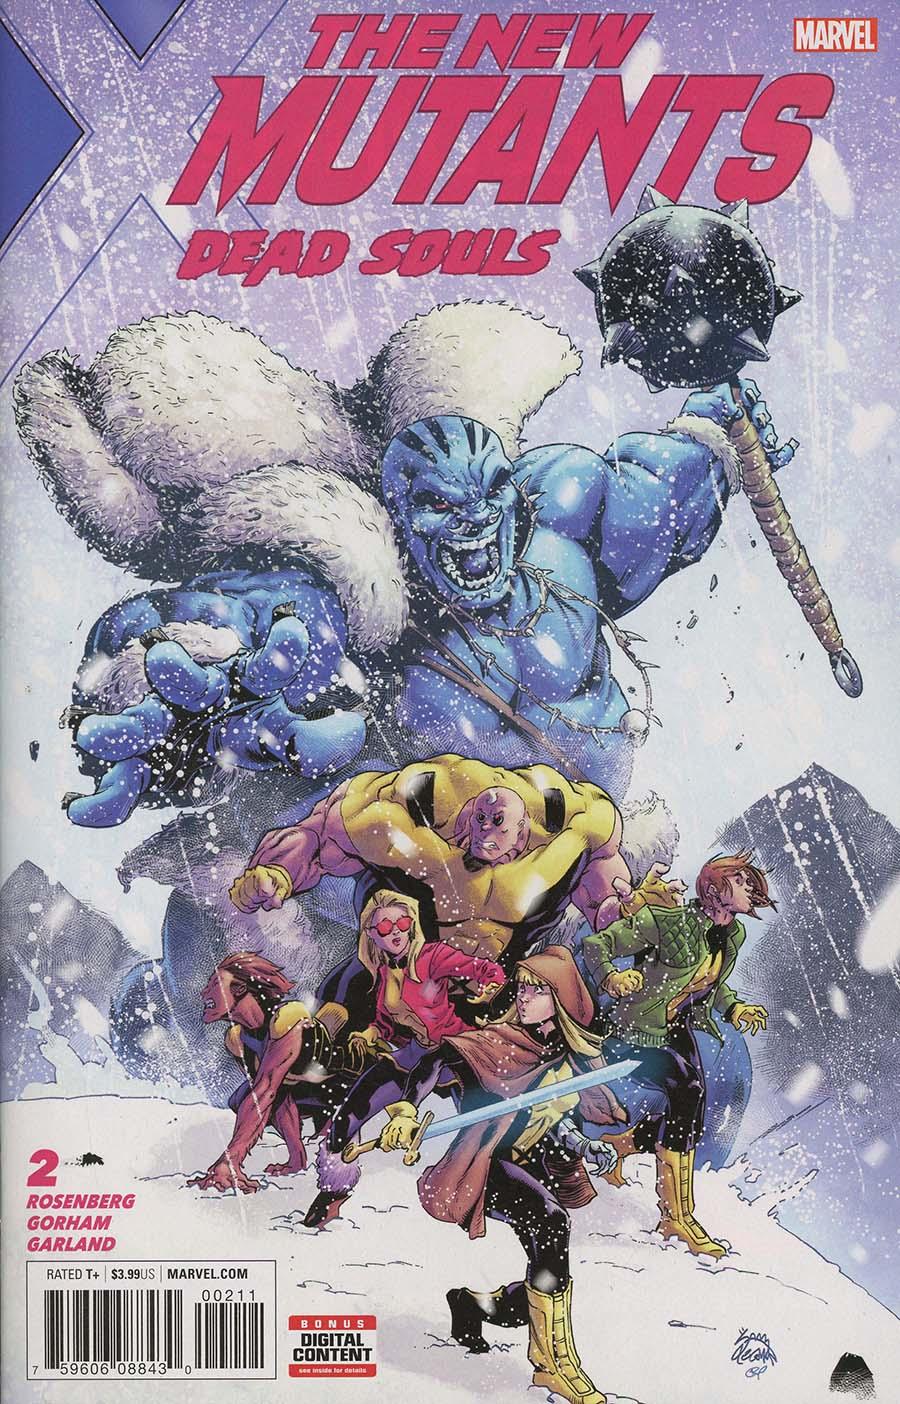 New Mutants Dead Souls #2 Cover A Regular Ryan Stegman Cover